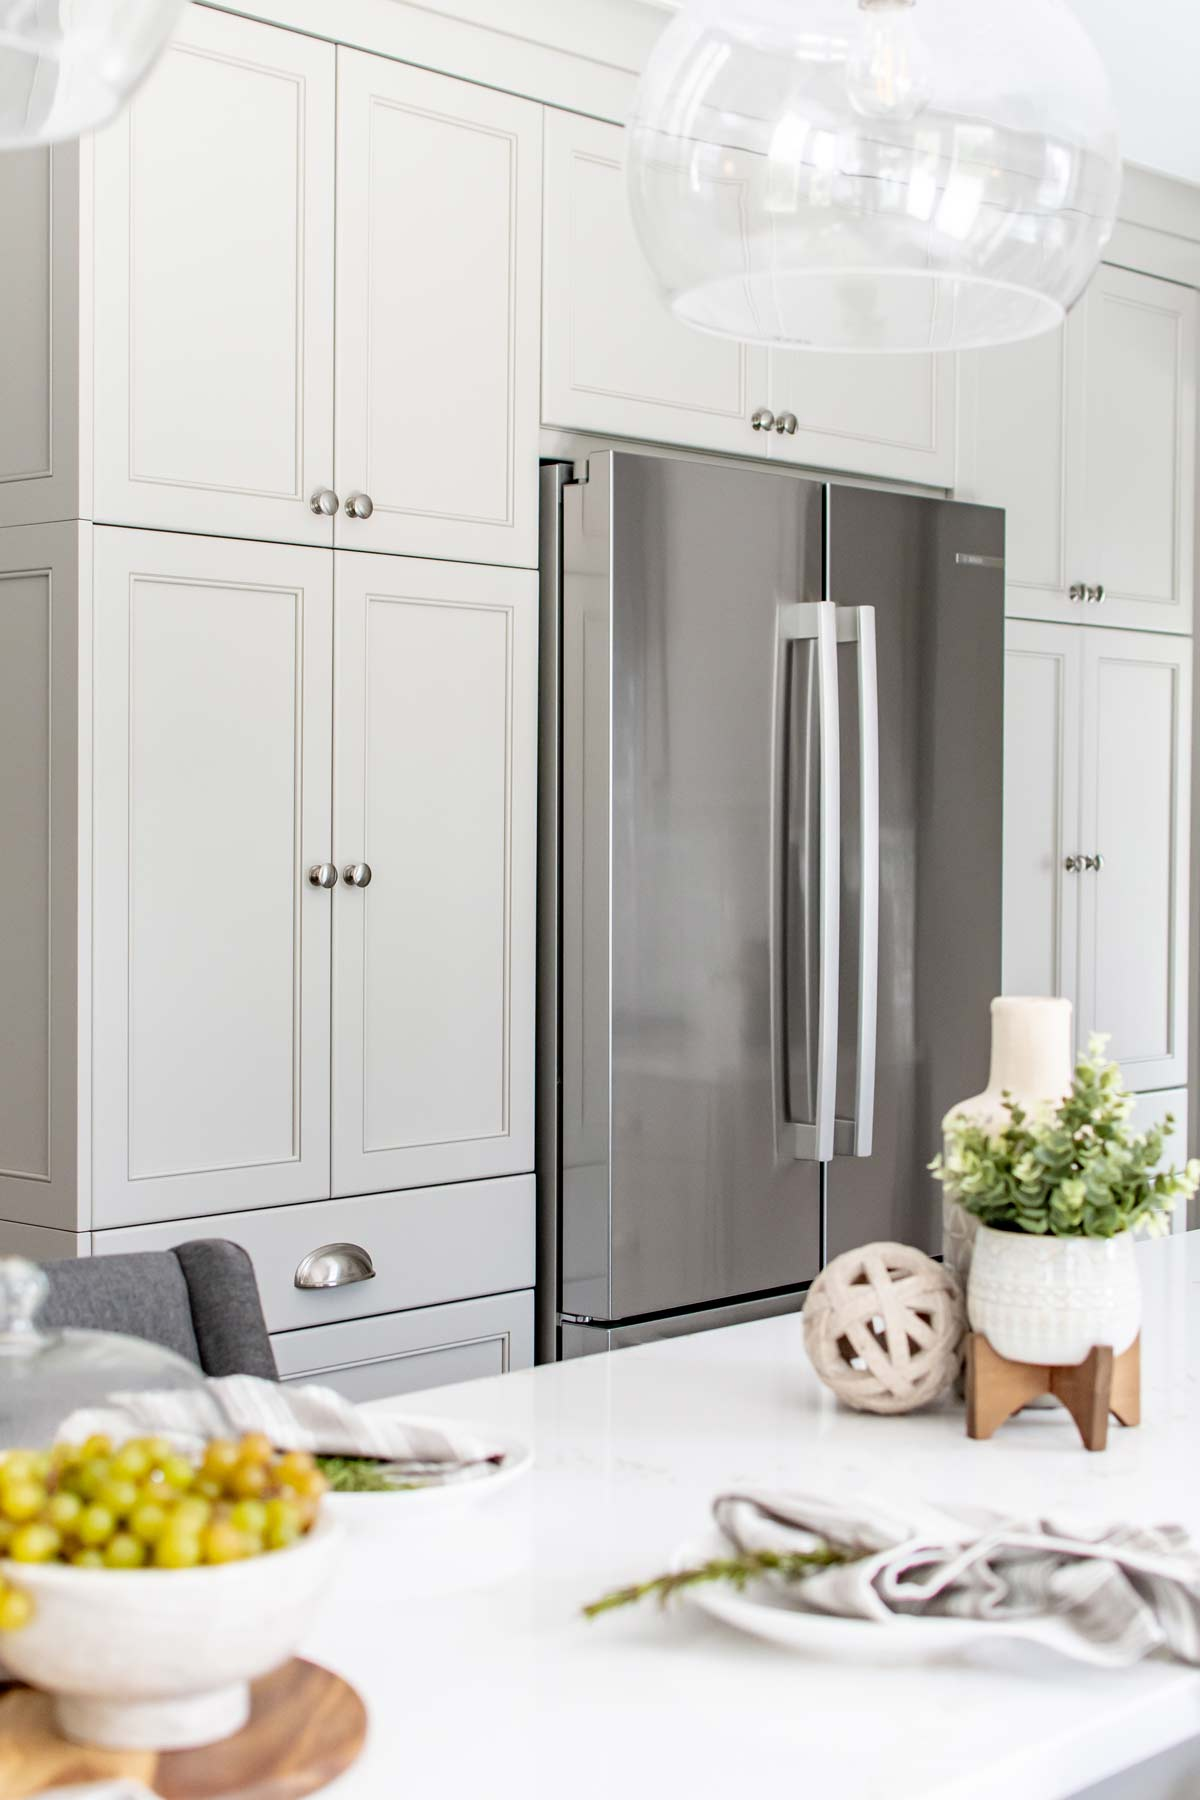 village-remodel-fridge